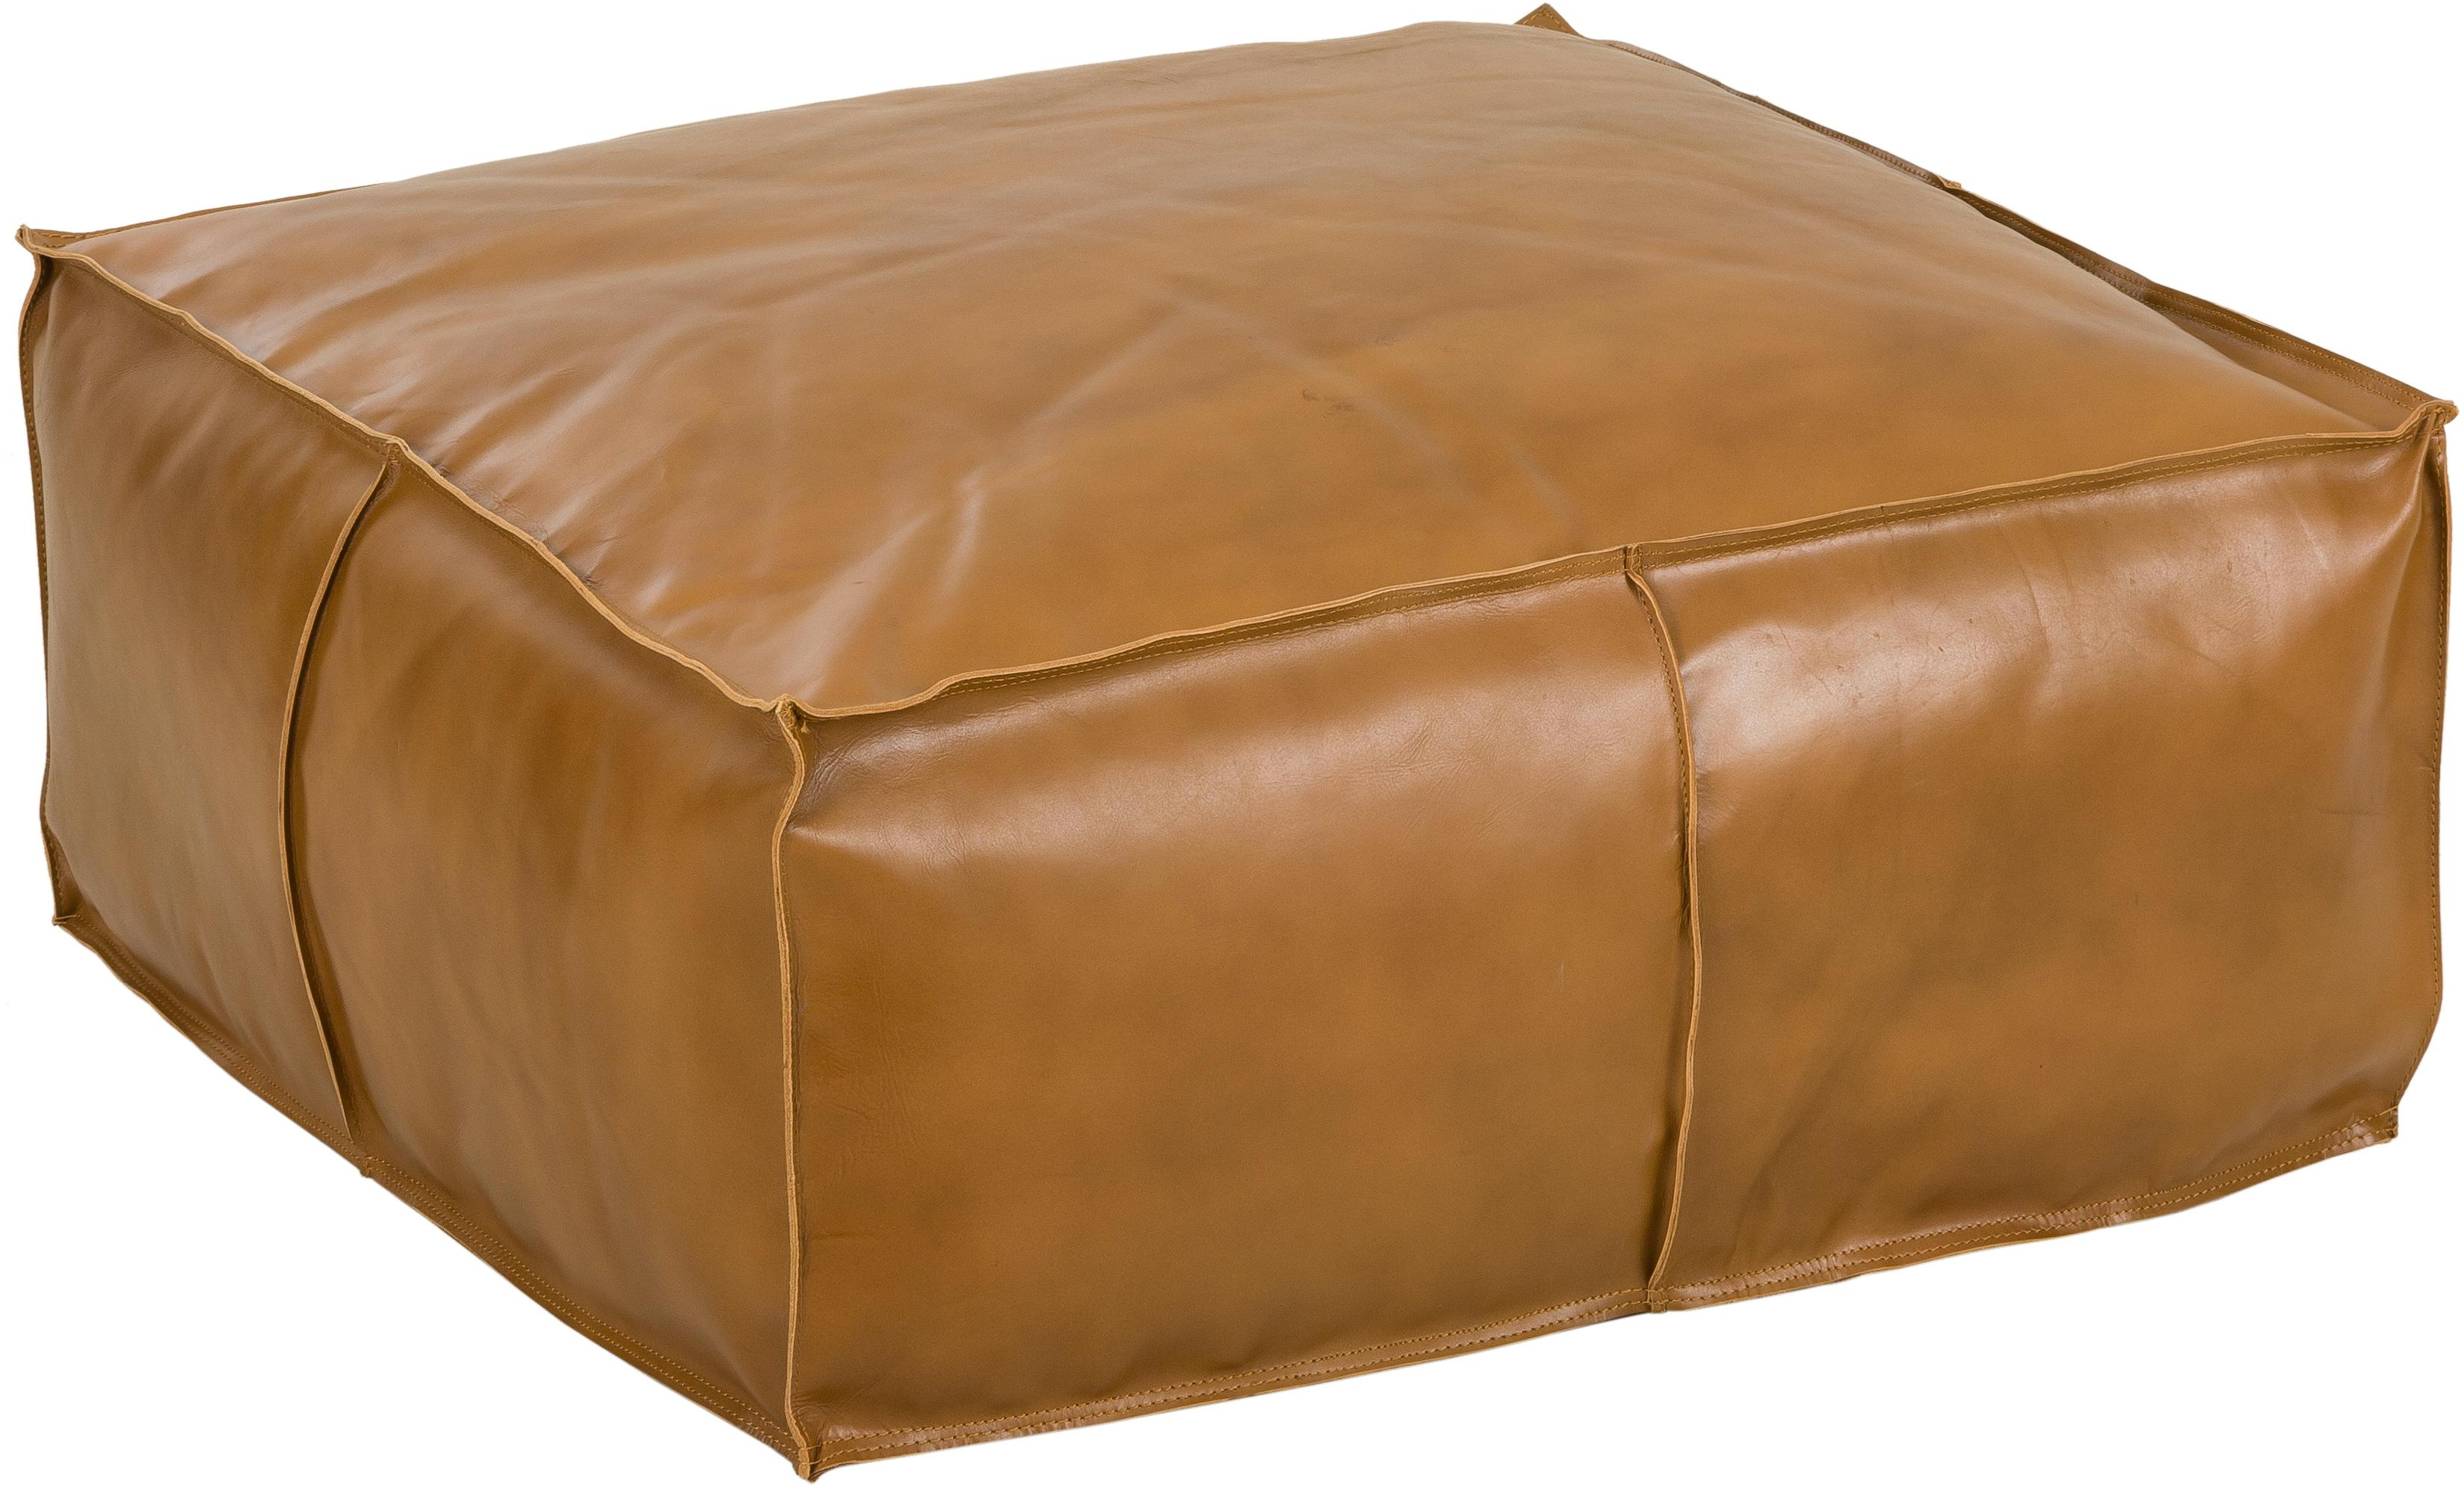 Cuscino da pavimento in pelle Arabica, Rivestimento: pelle, Cognac, Larg. 70 x Alt. 30 cm